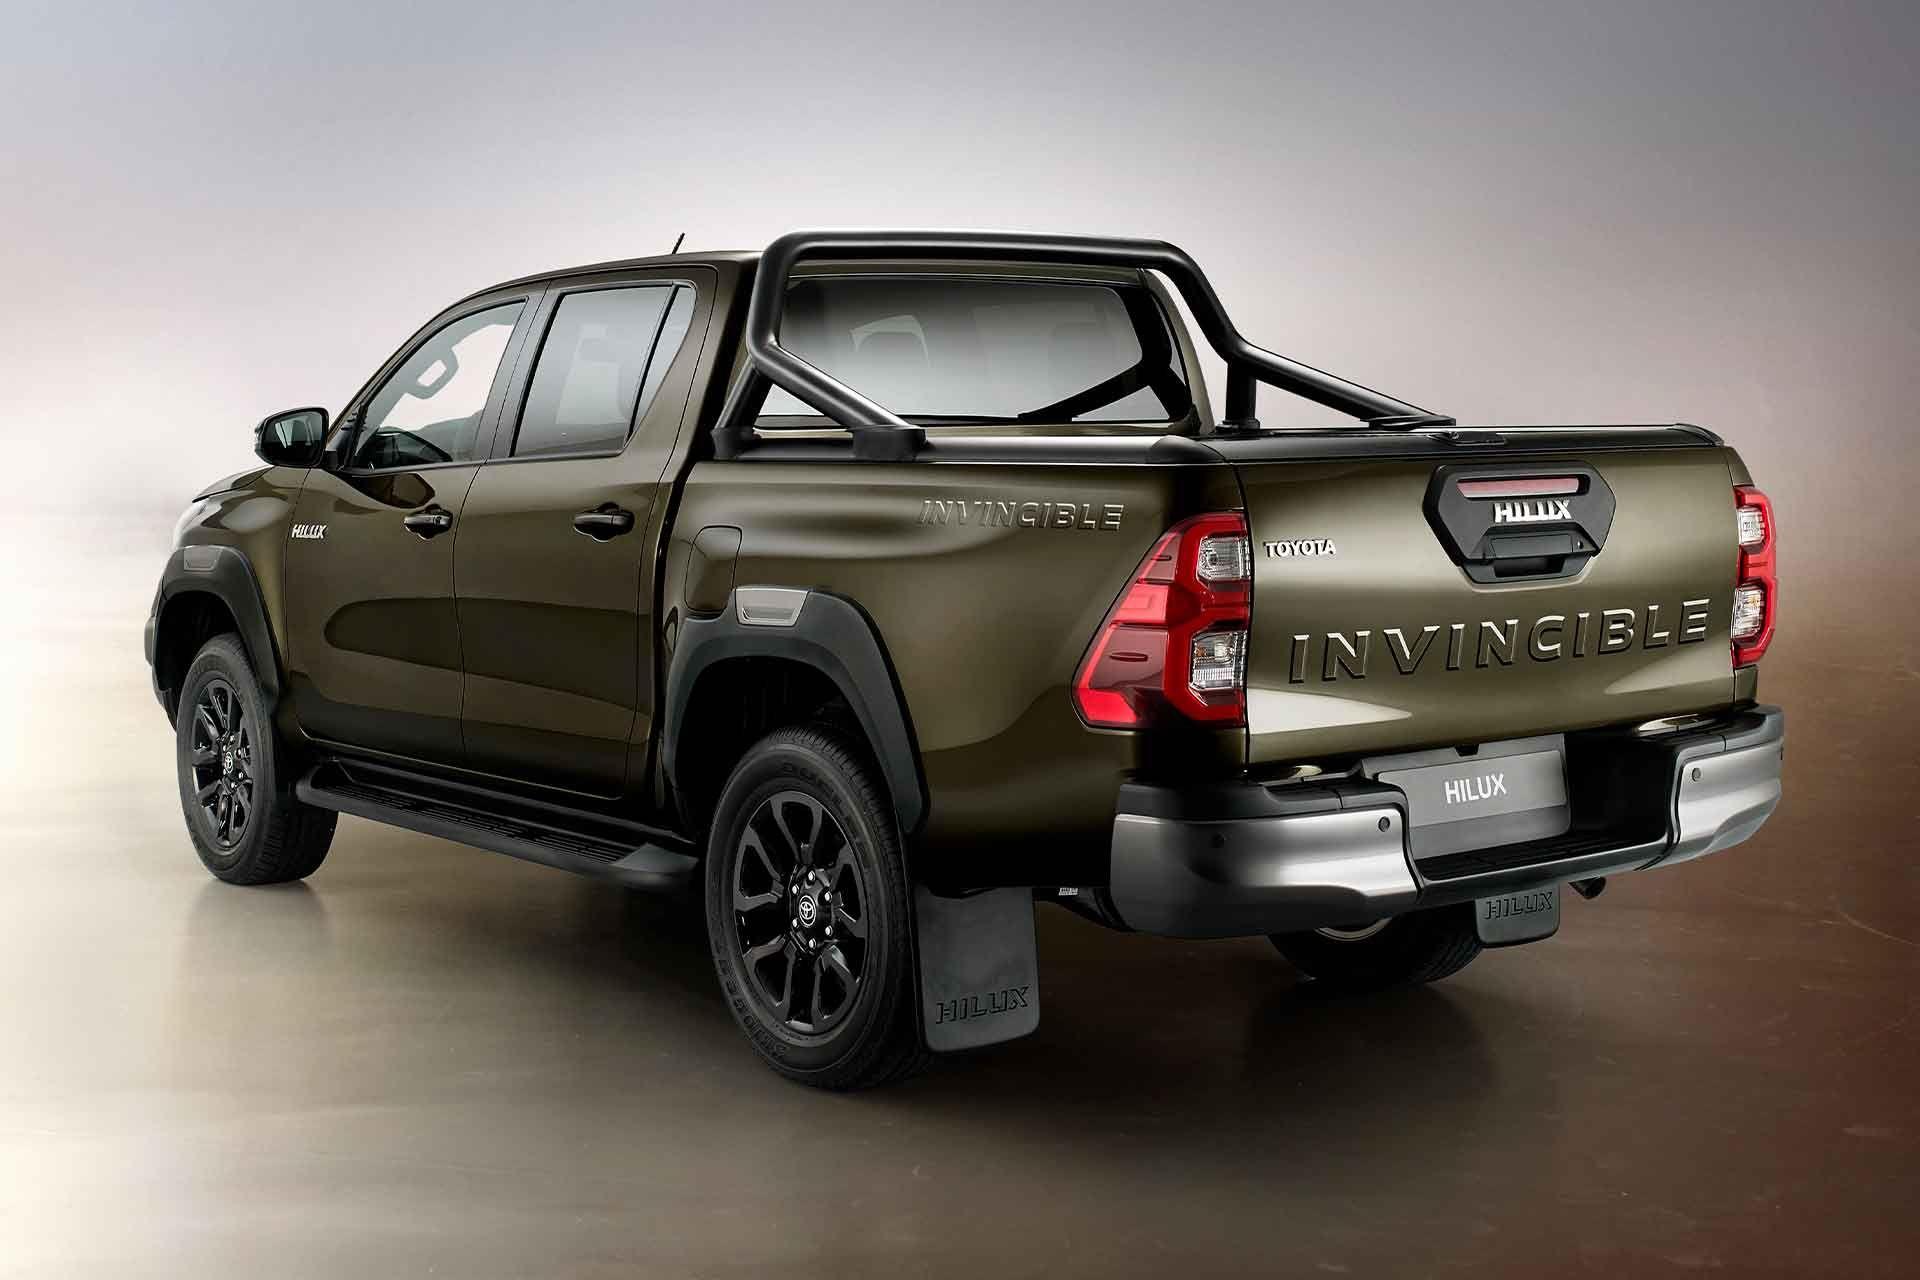 Toyota Hilux Invincible X Truck In 2020 Toyota Hilux New Trucks Toyota